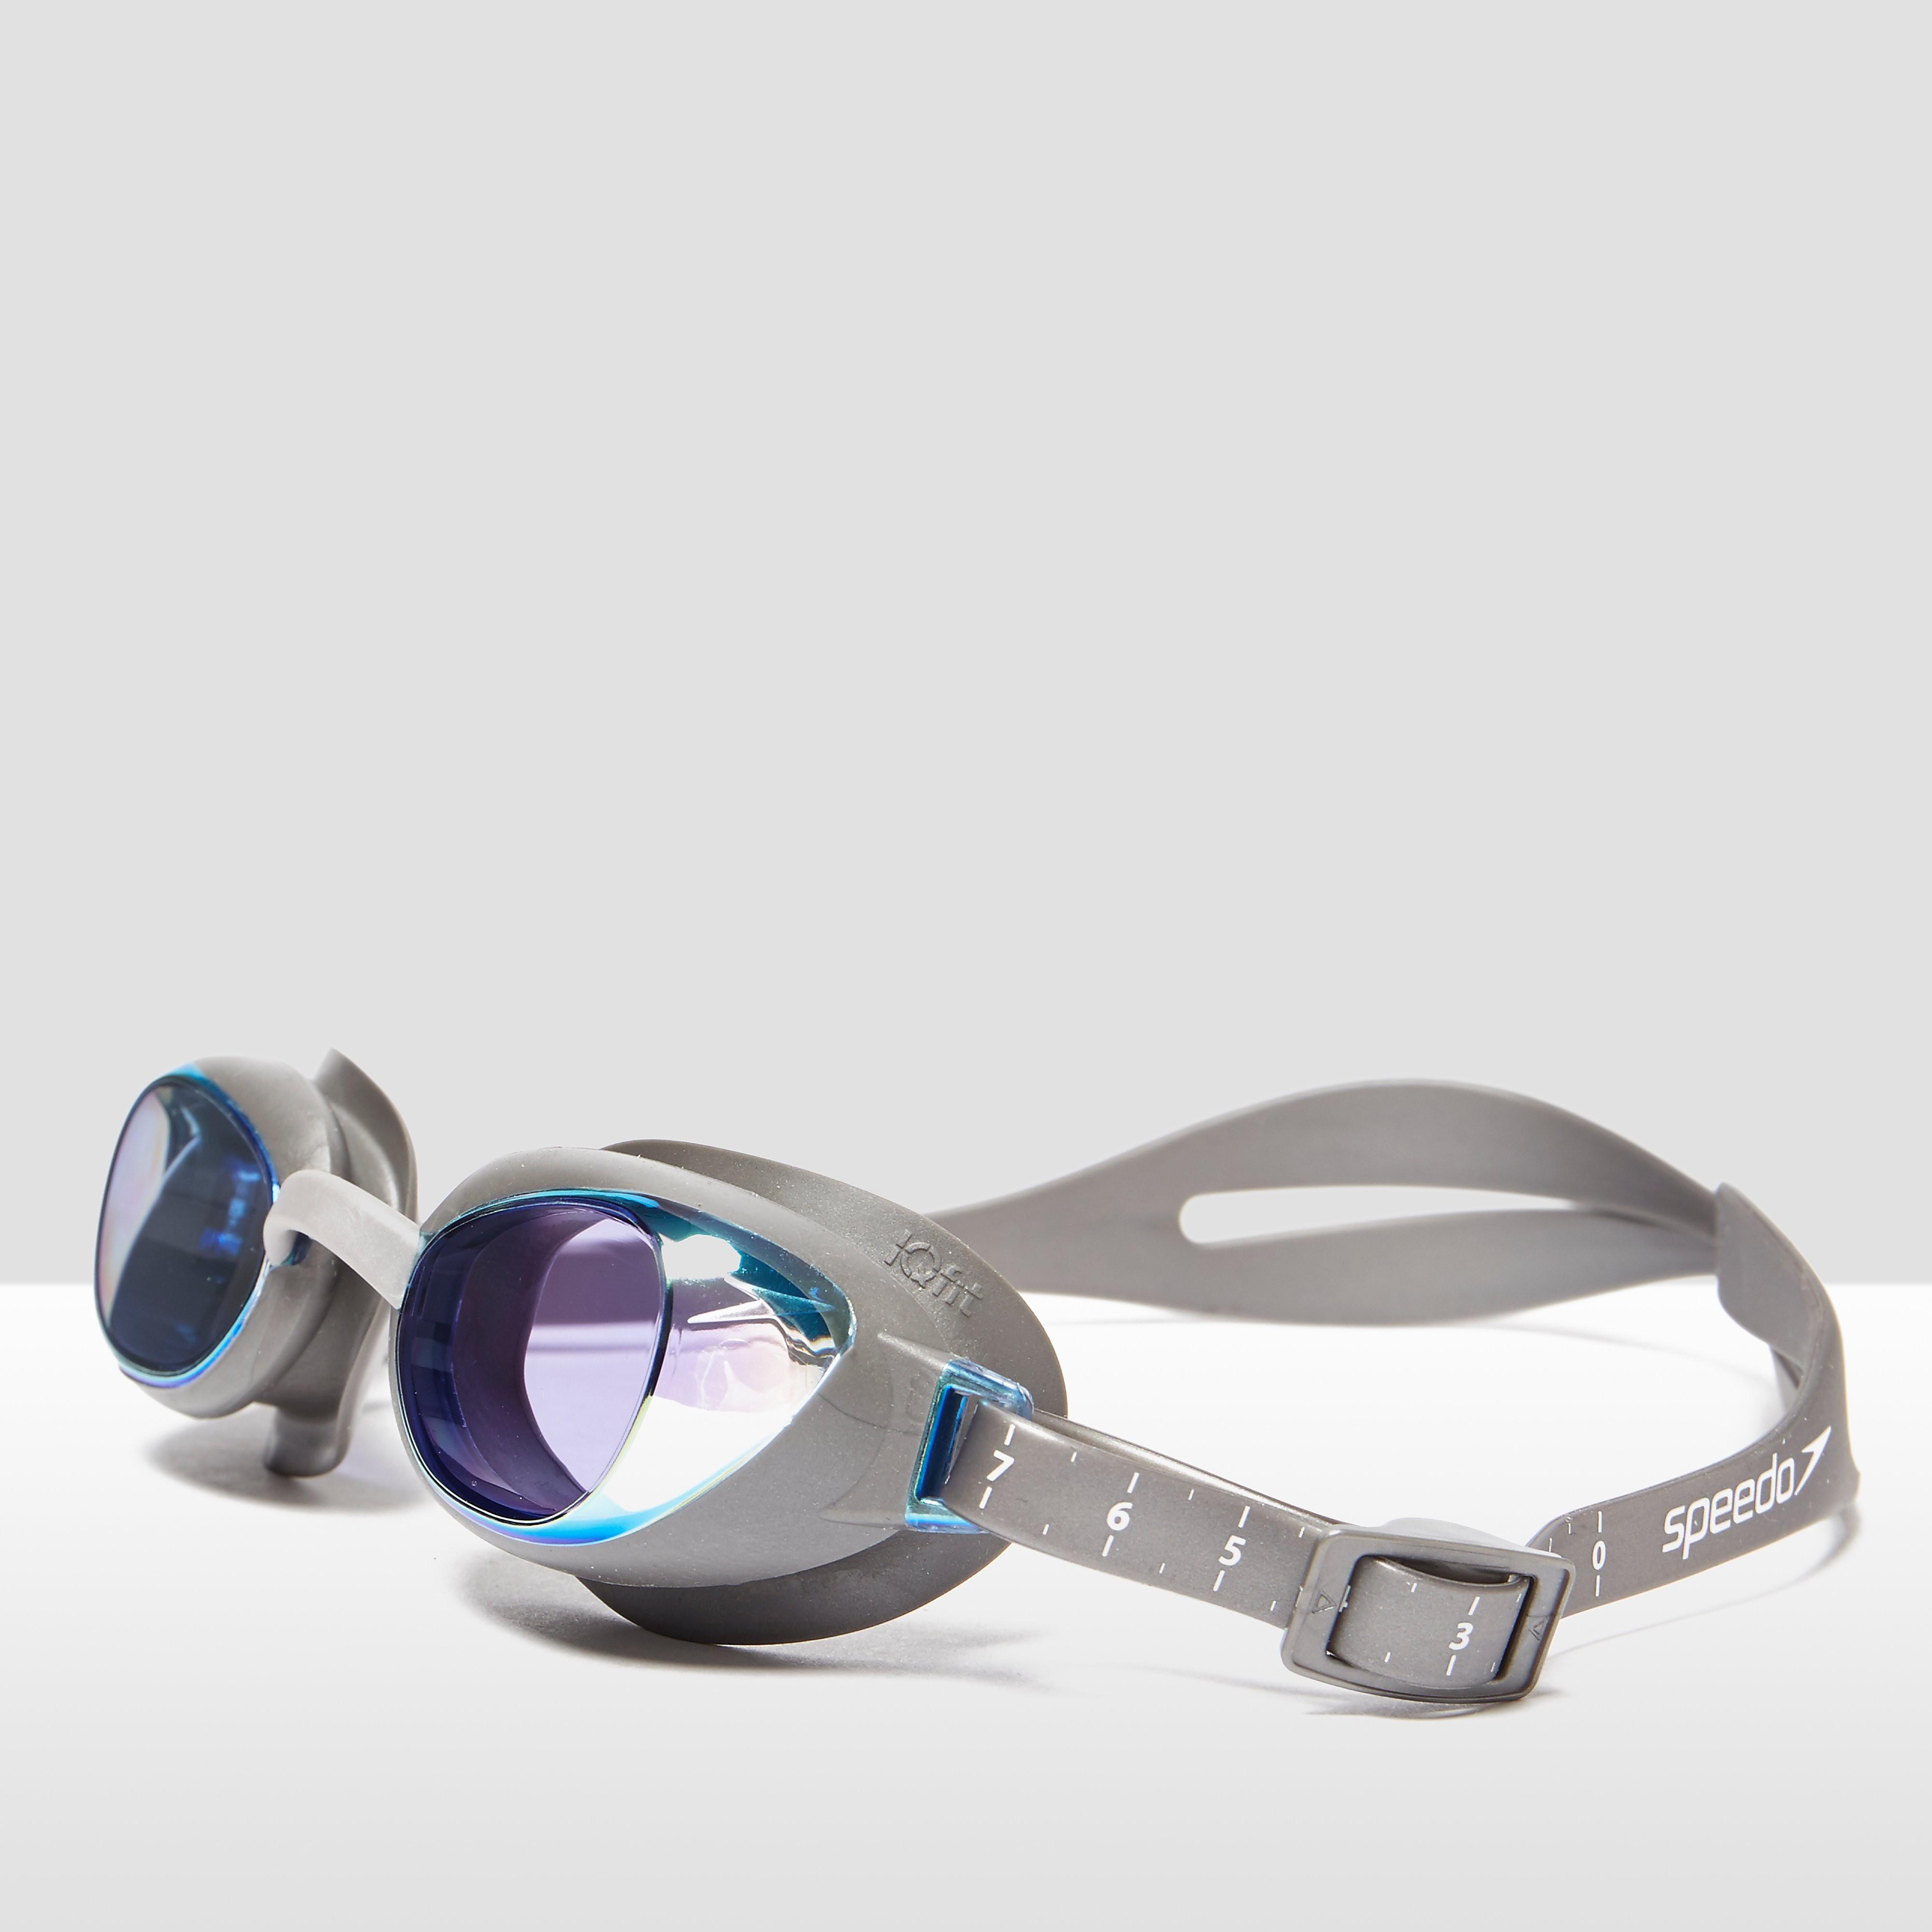 Speedo Aquapure Mirror Women's Swimming Goggles